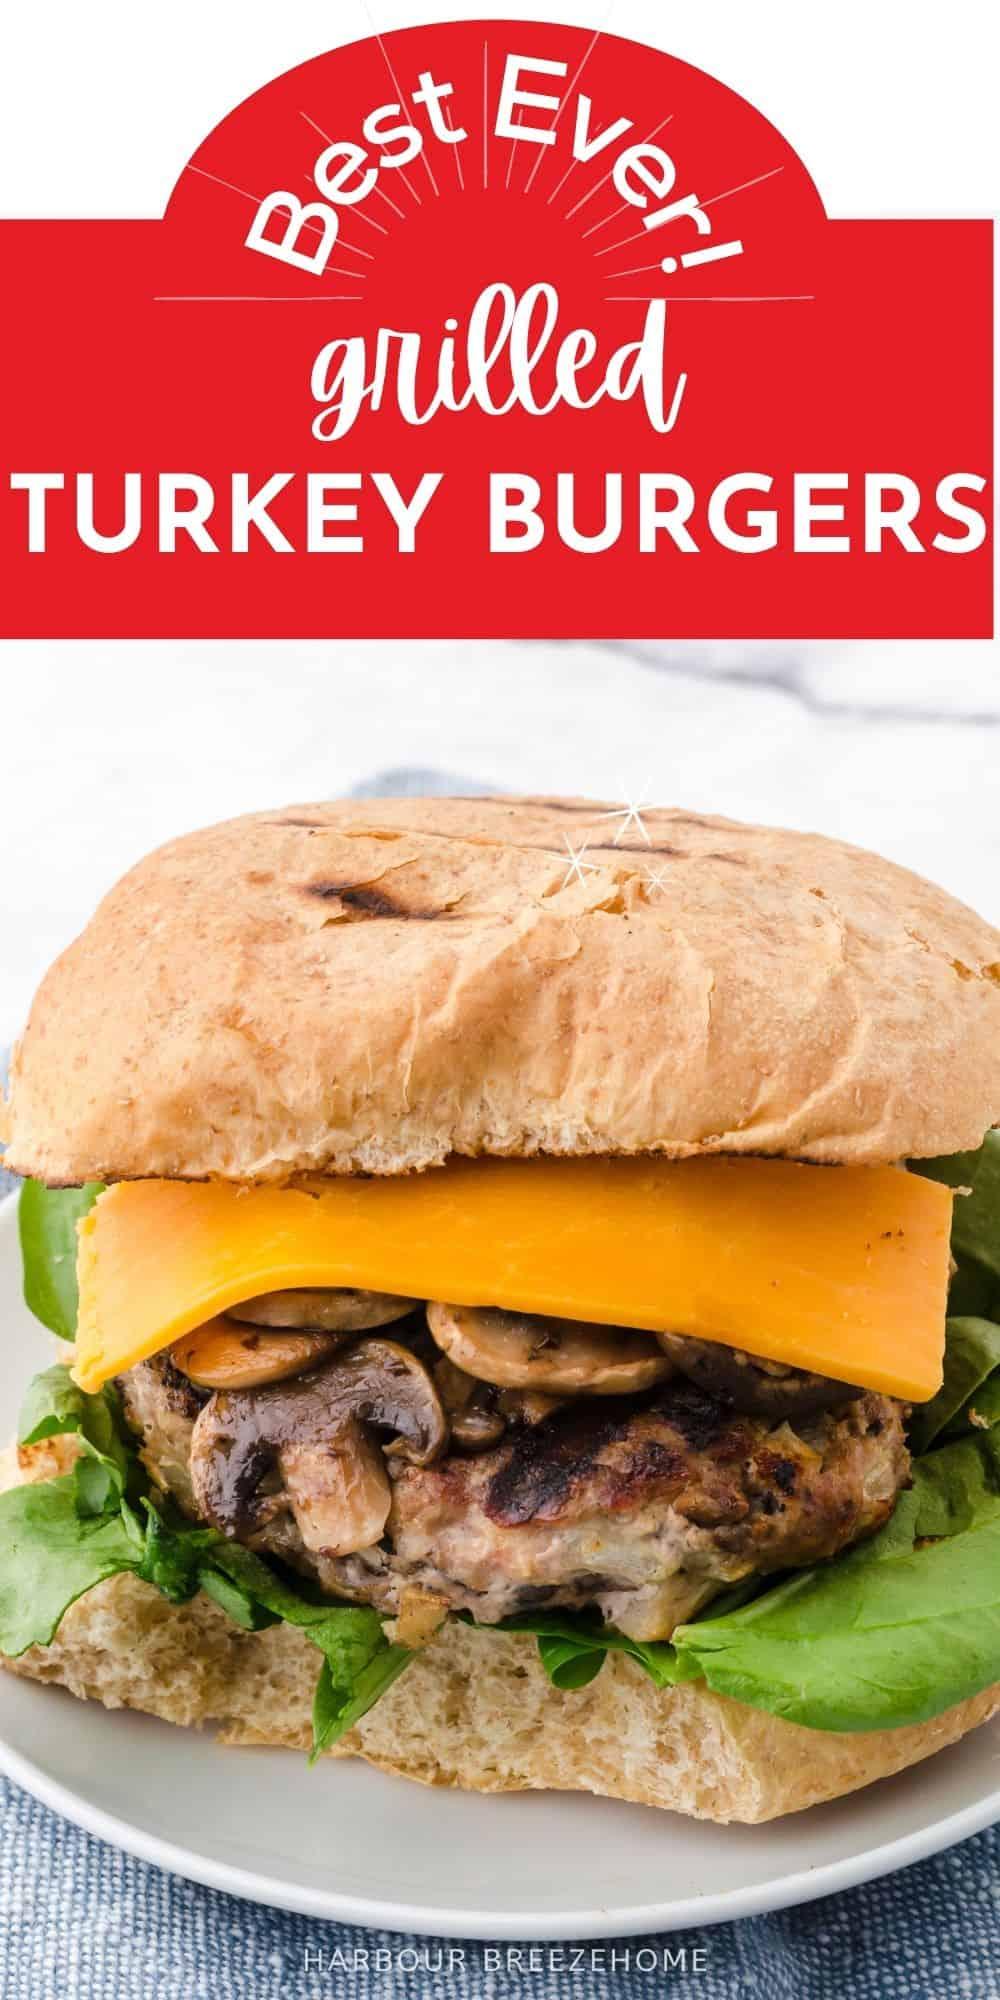 Grilled Turkey Burgers Recipe